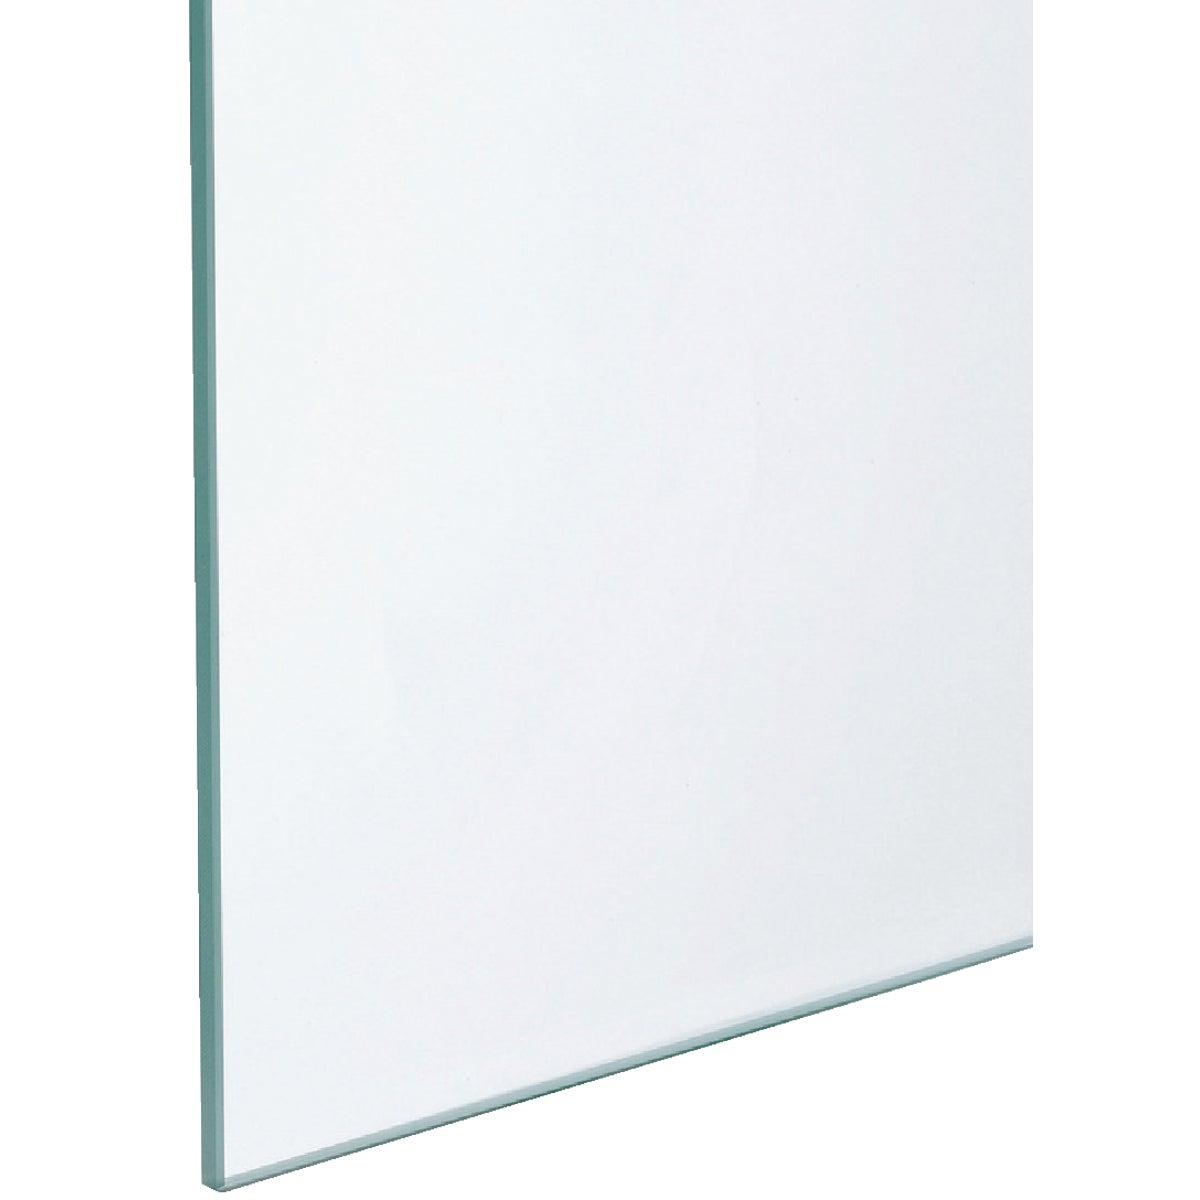 12X24SSB WINDOW GLASS 25 - 12X24 by Knight Industrs Corp